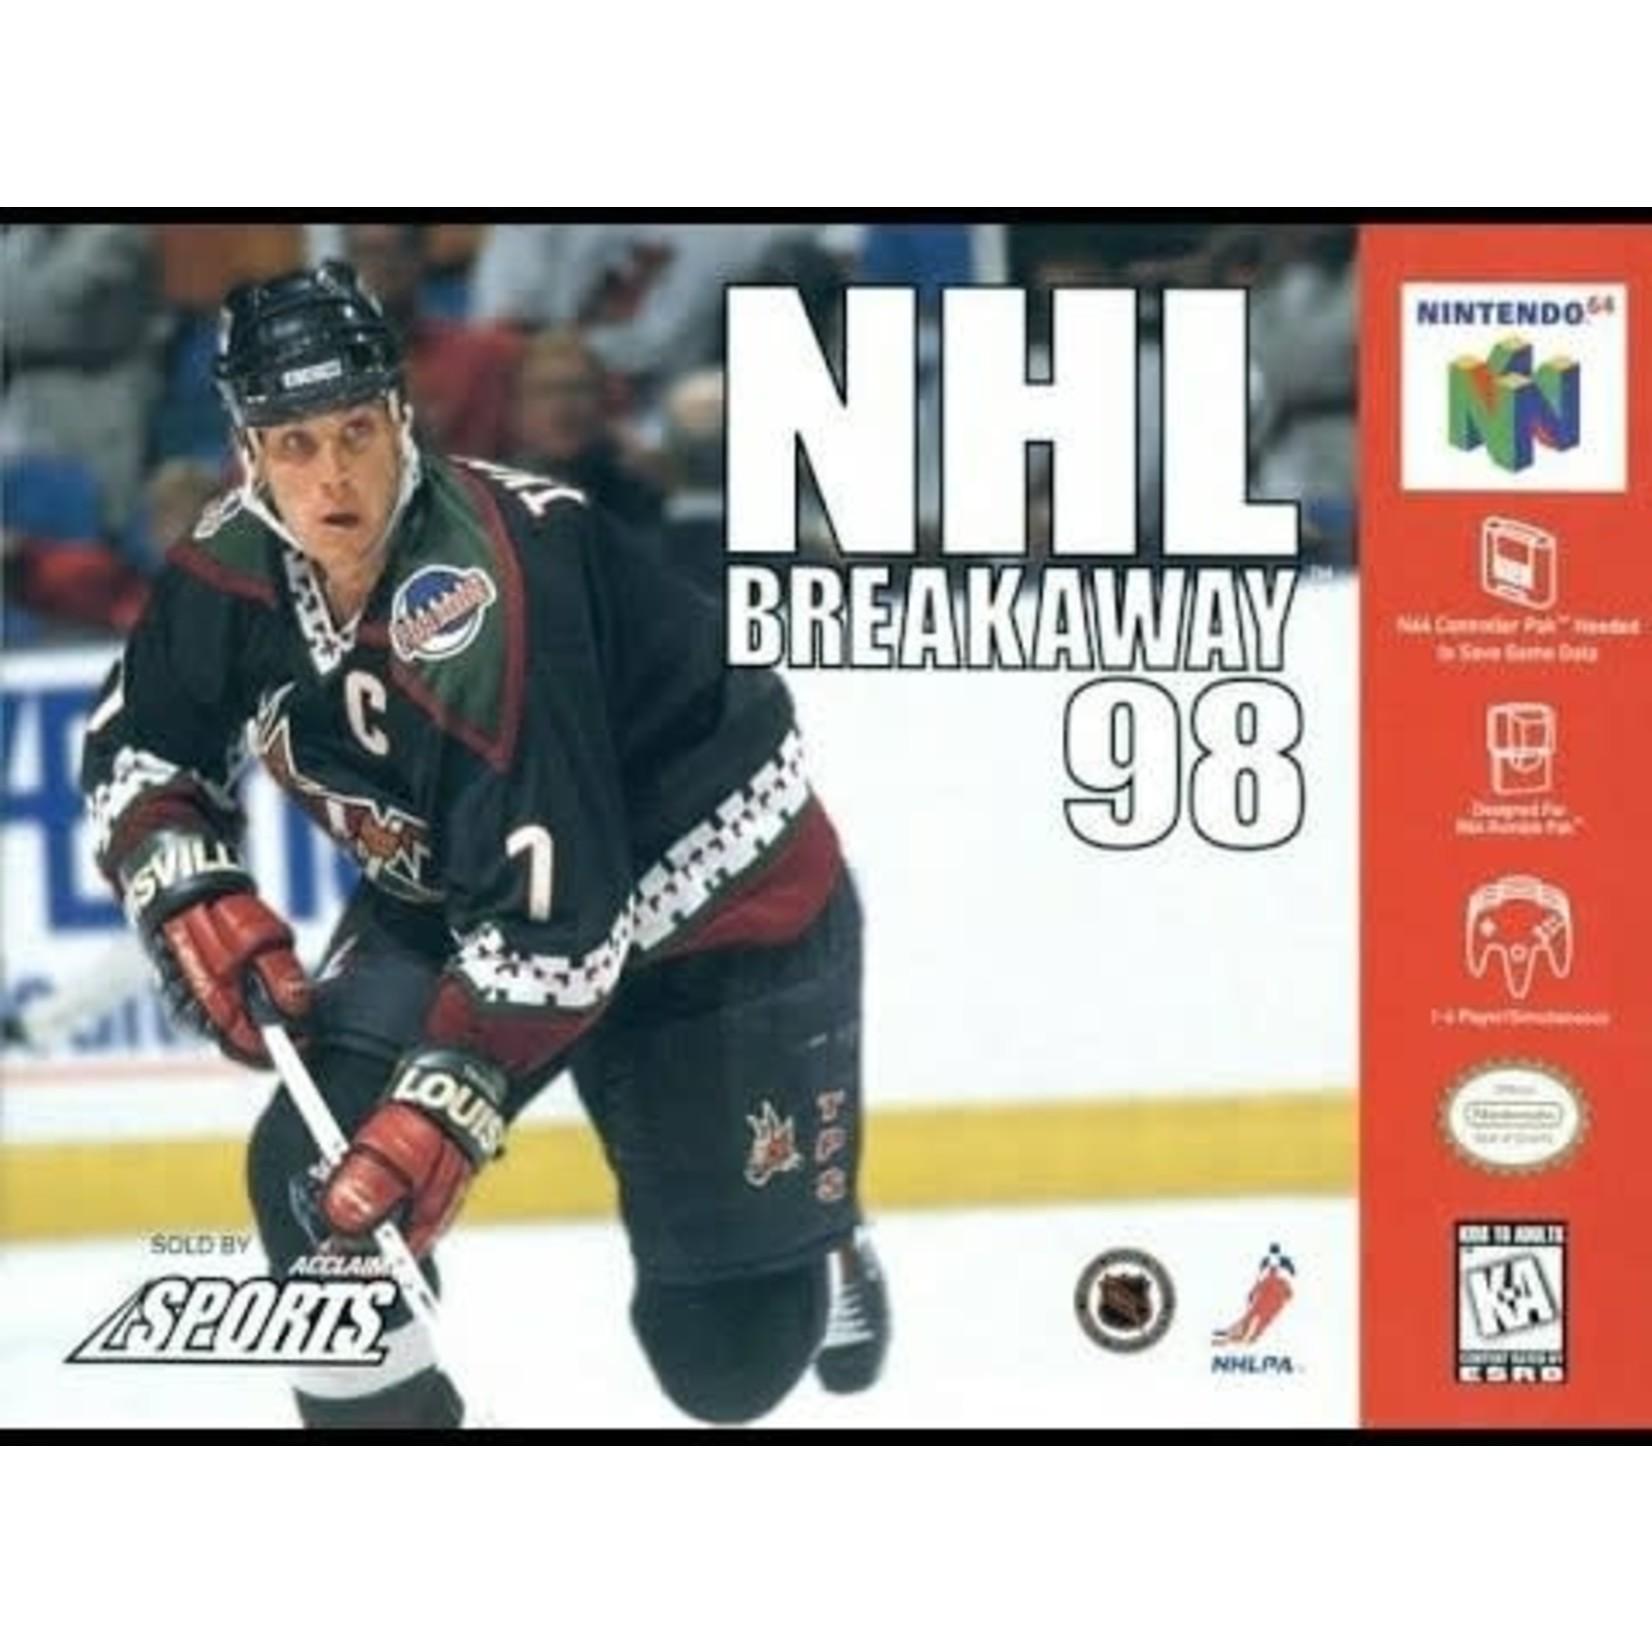 N64U-NHL Breakaway '98 (Boxed)